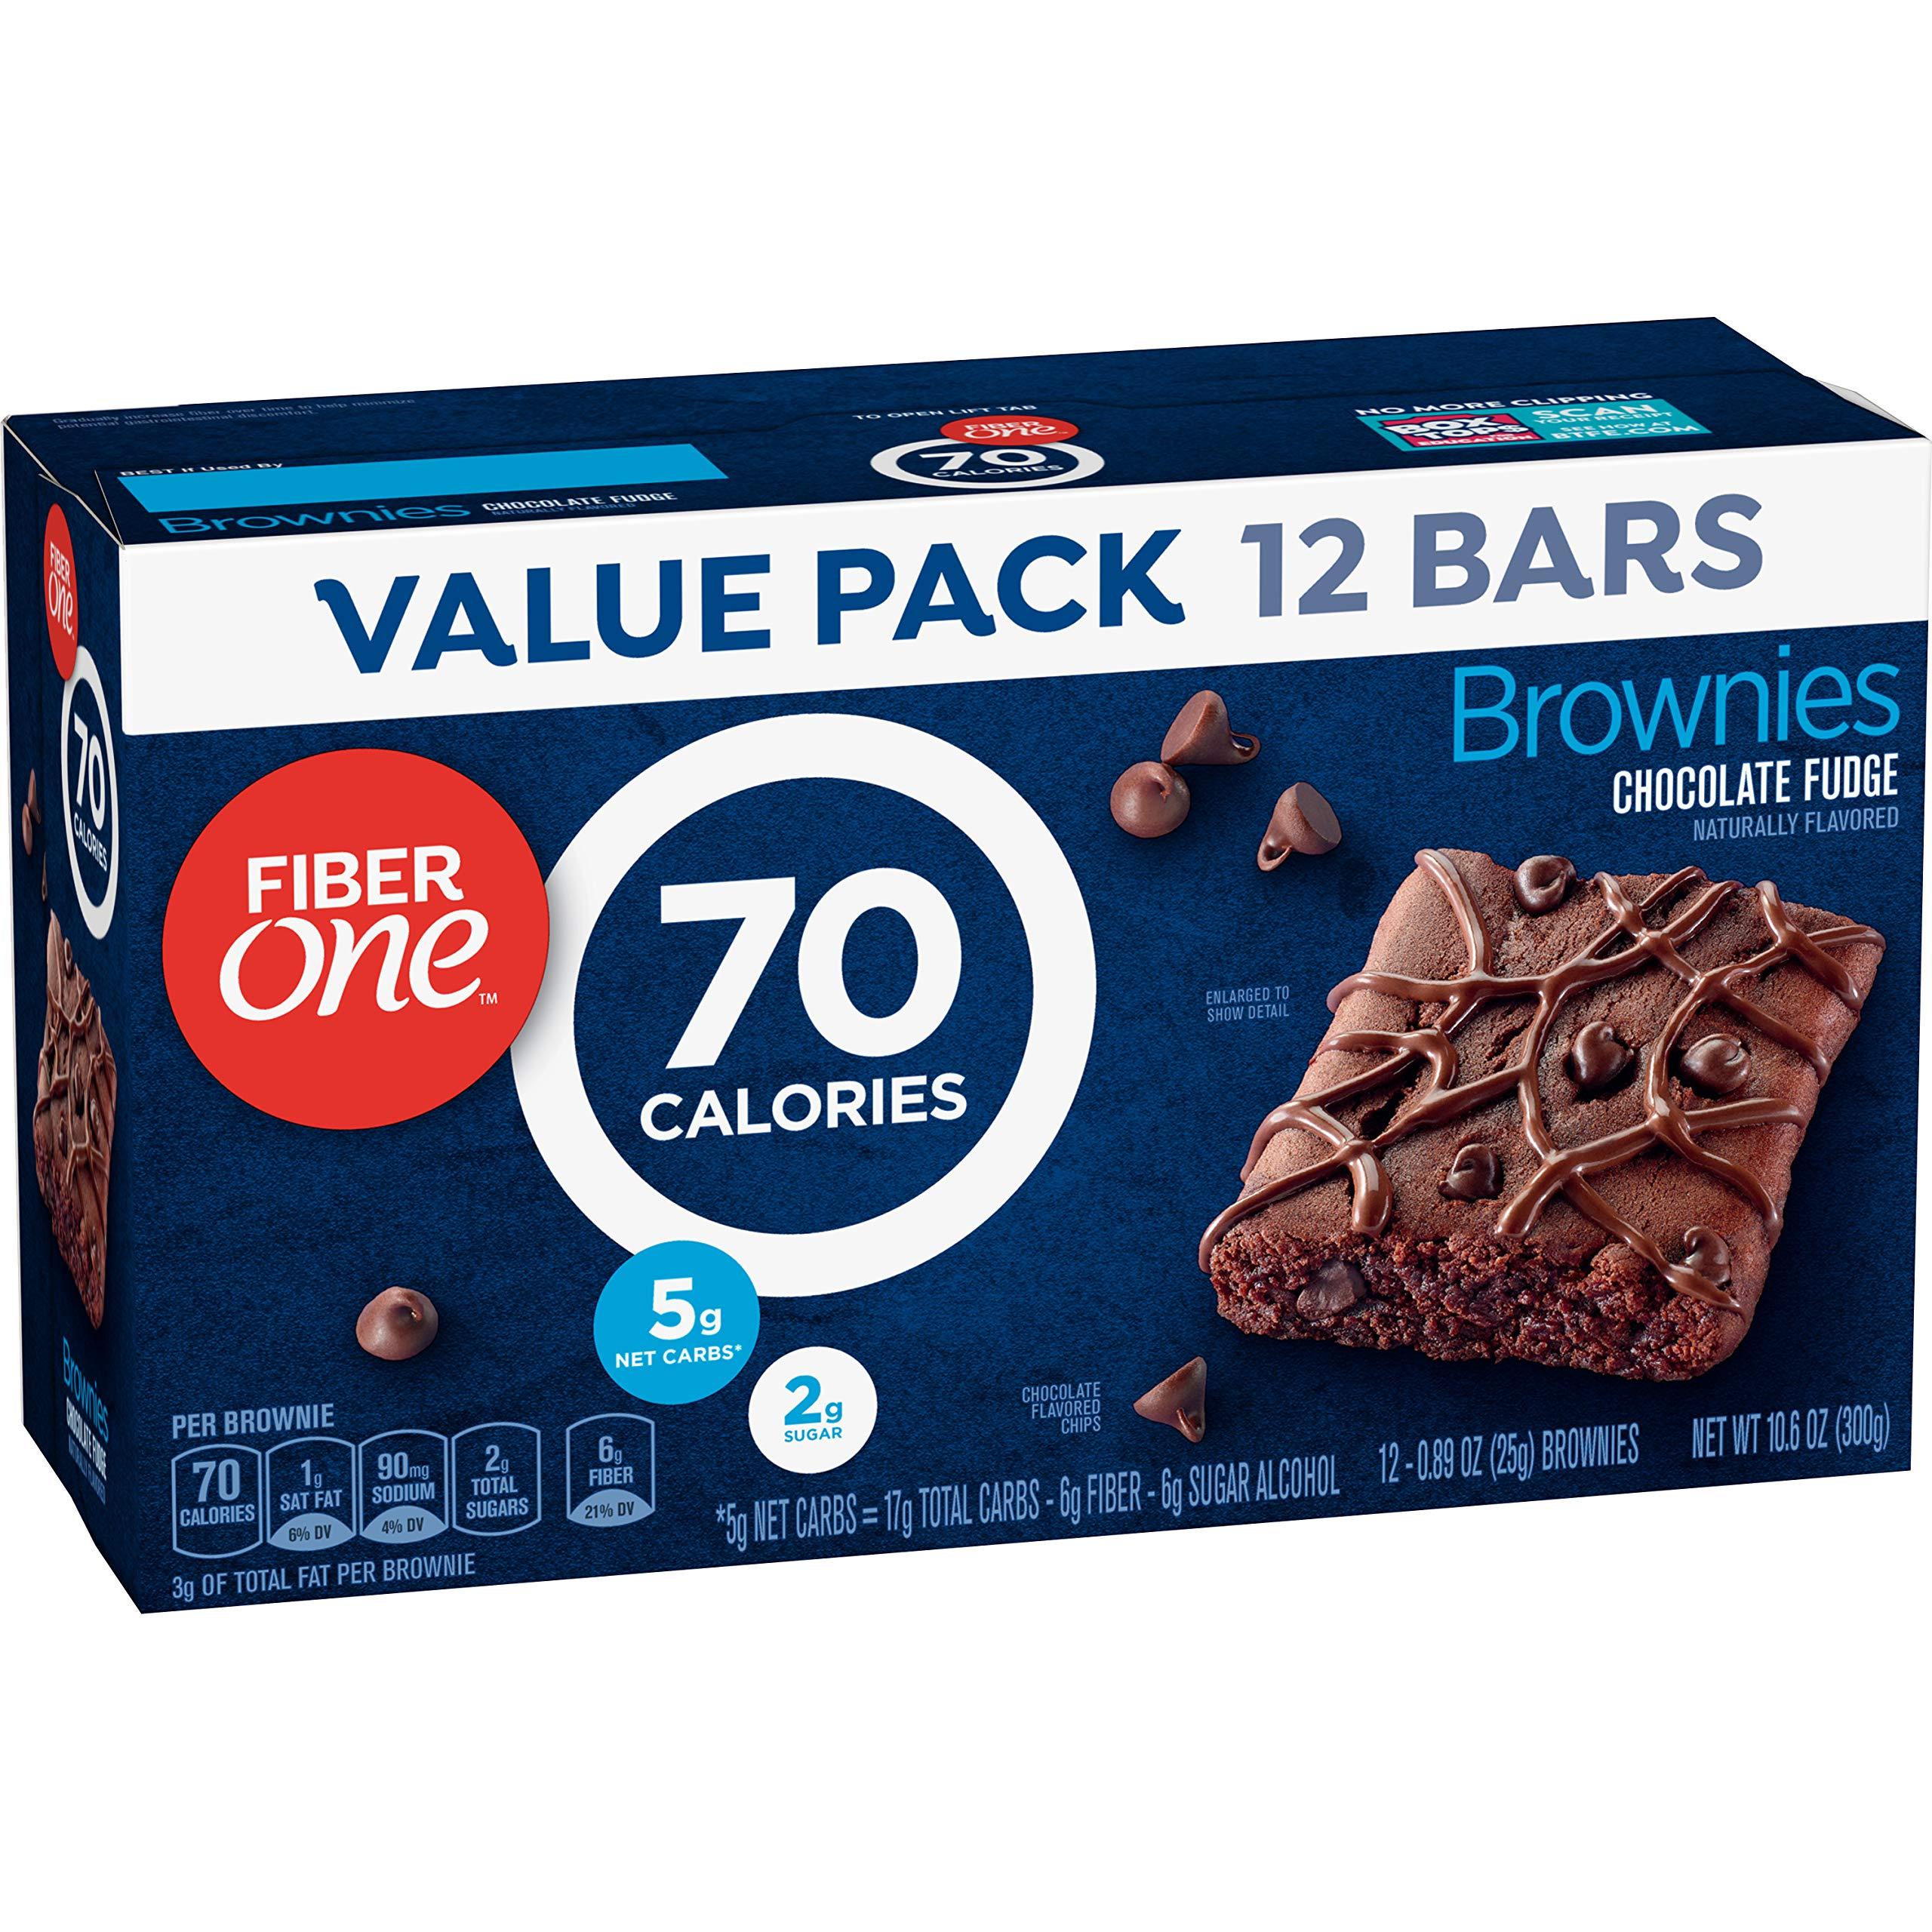 Fiber One Brownies, 70 Calorie Bar, Chocolate Fudge Brownie, 12 Fiber Bars, 10.6 oz